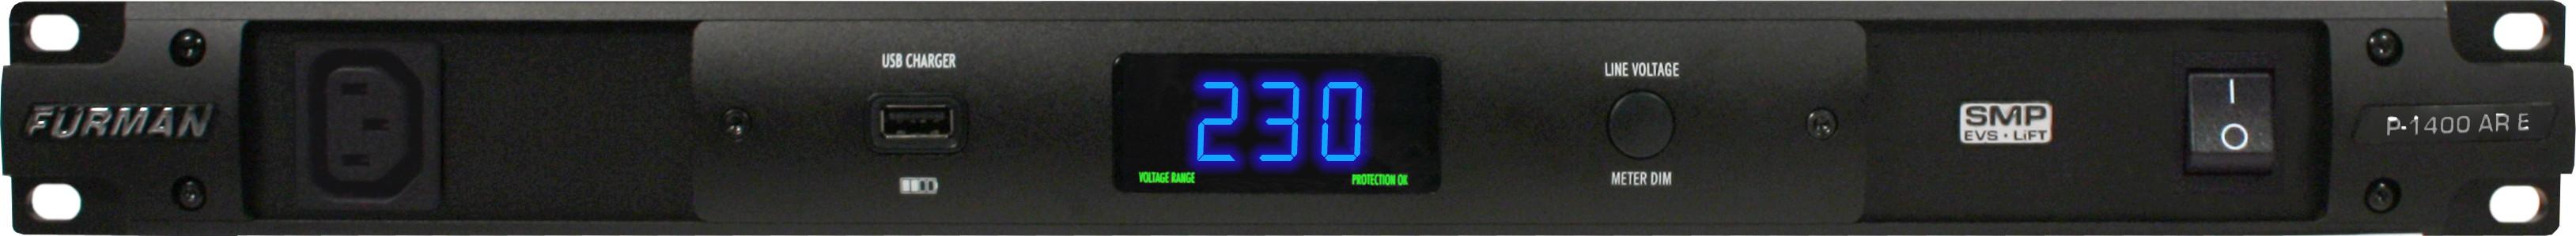 Furman P 1400 AR E Voltage Regulator